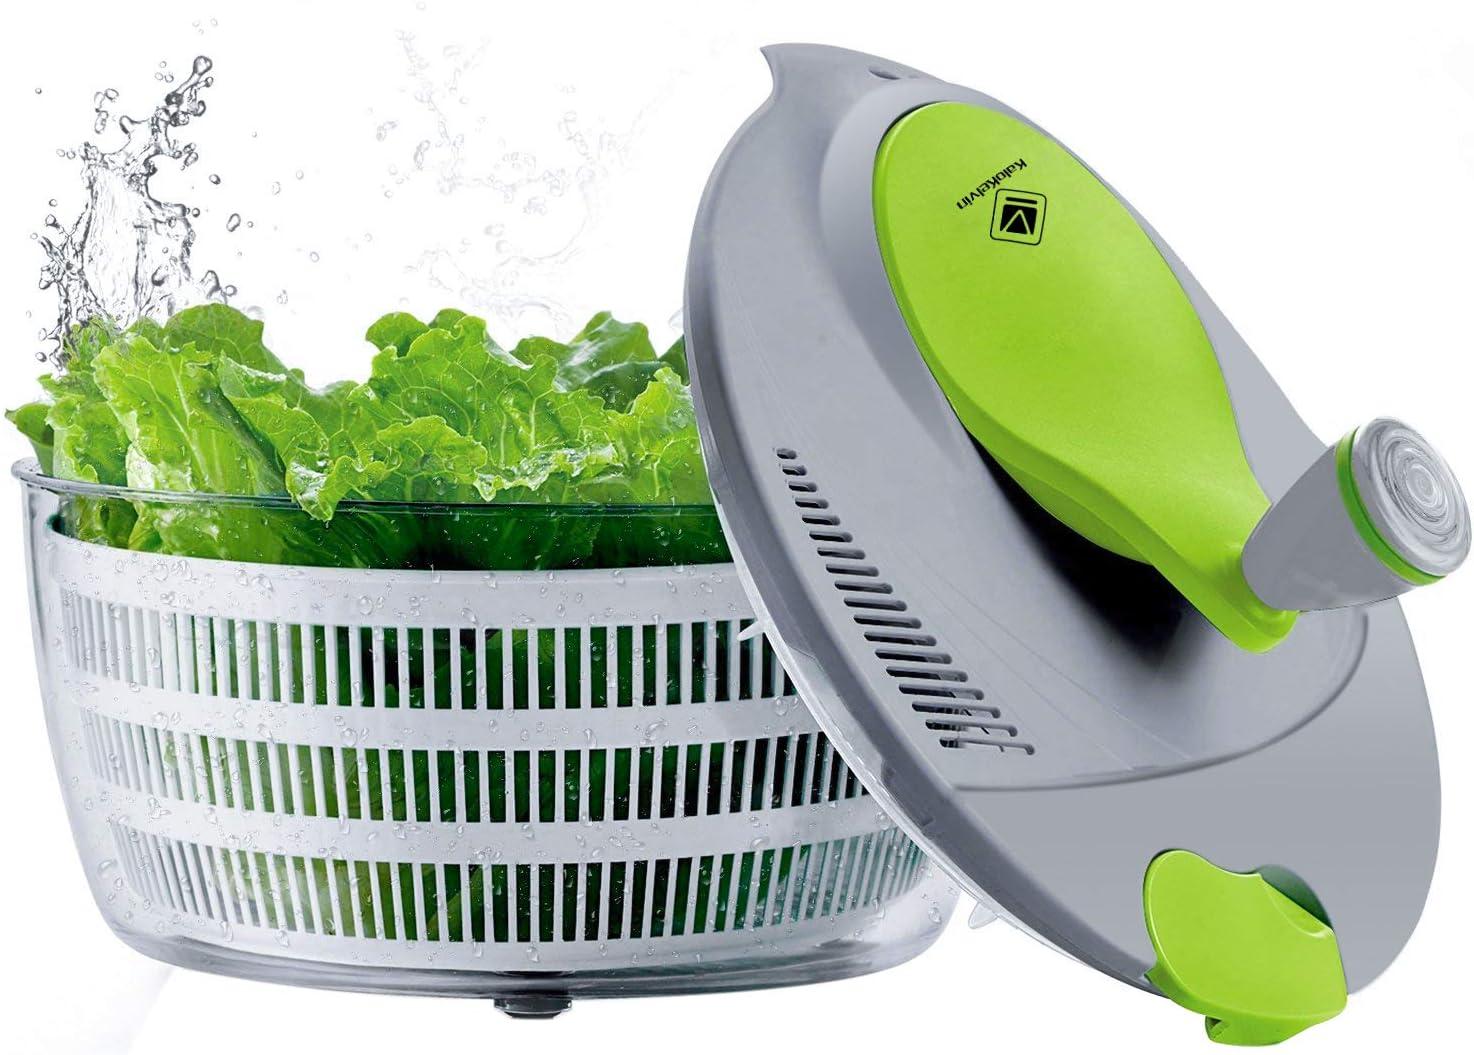 kalokelvin Salad Spinner 4 Quarts Quick Vegetables Dryer BPA Free Drain Lettuce and Vegetable for Home Kitchen